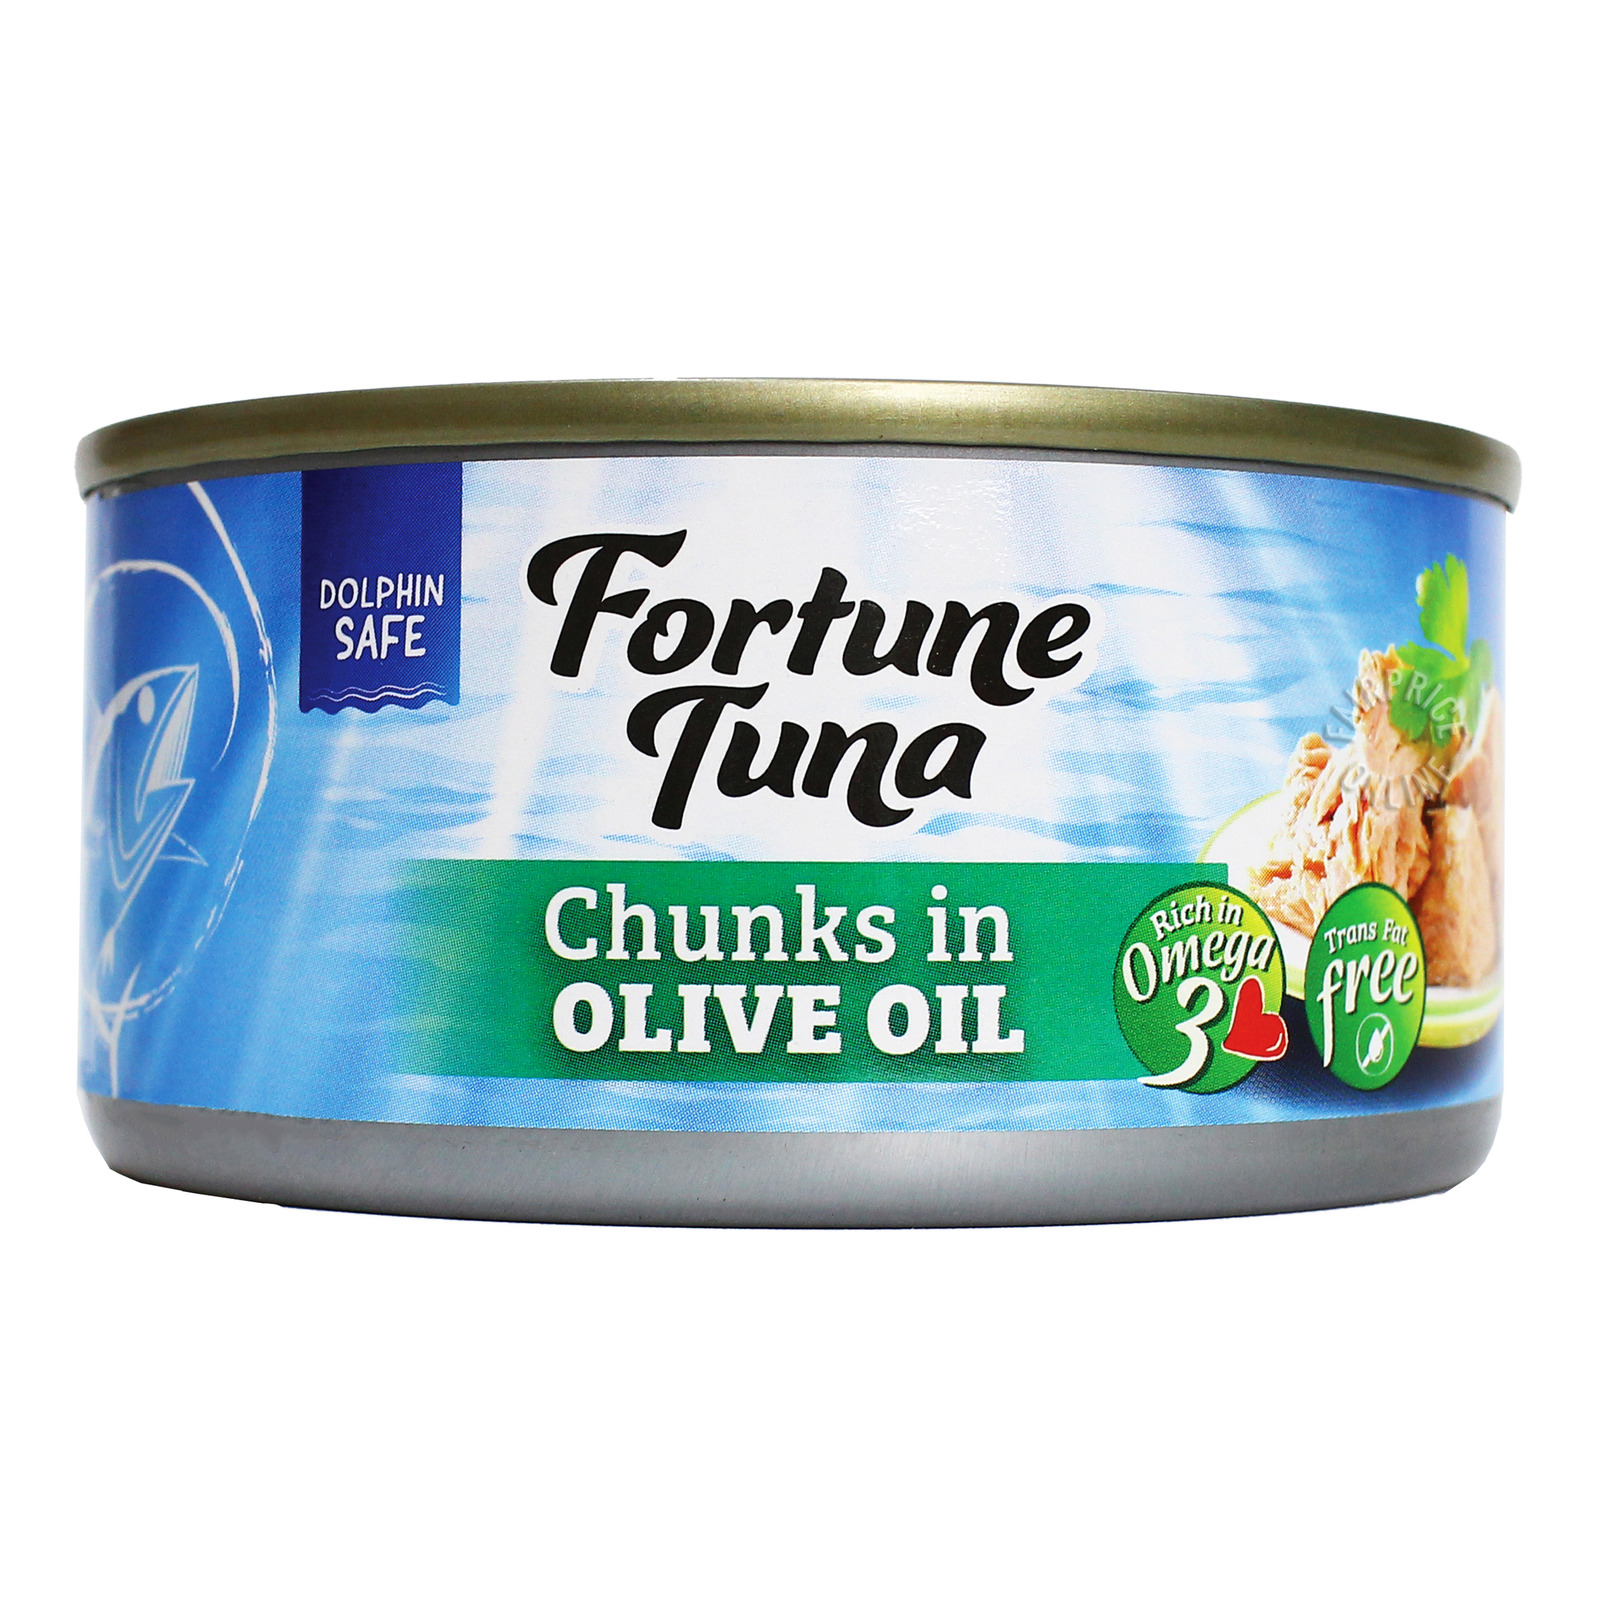 Fortune Tuna Chunks in Olive Oil